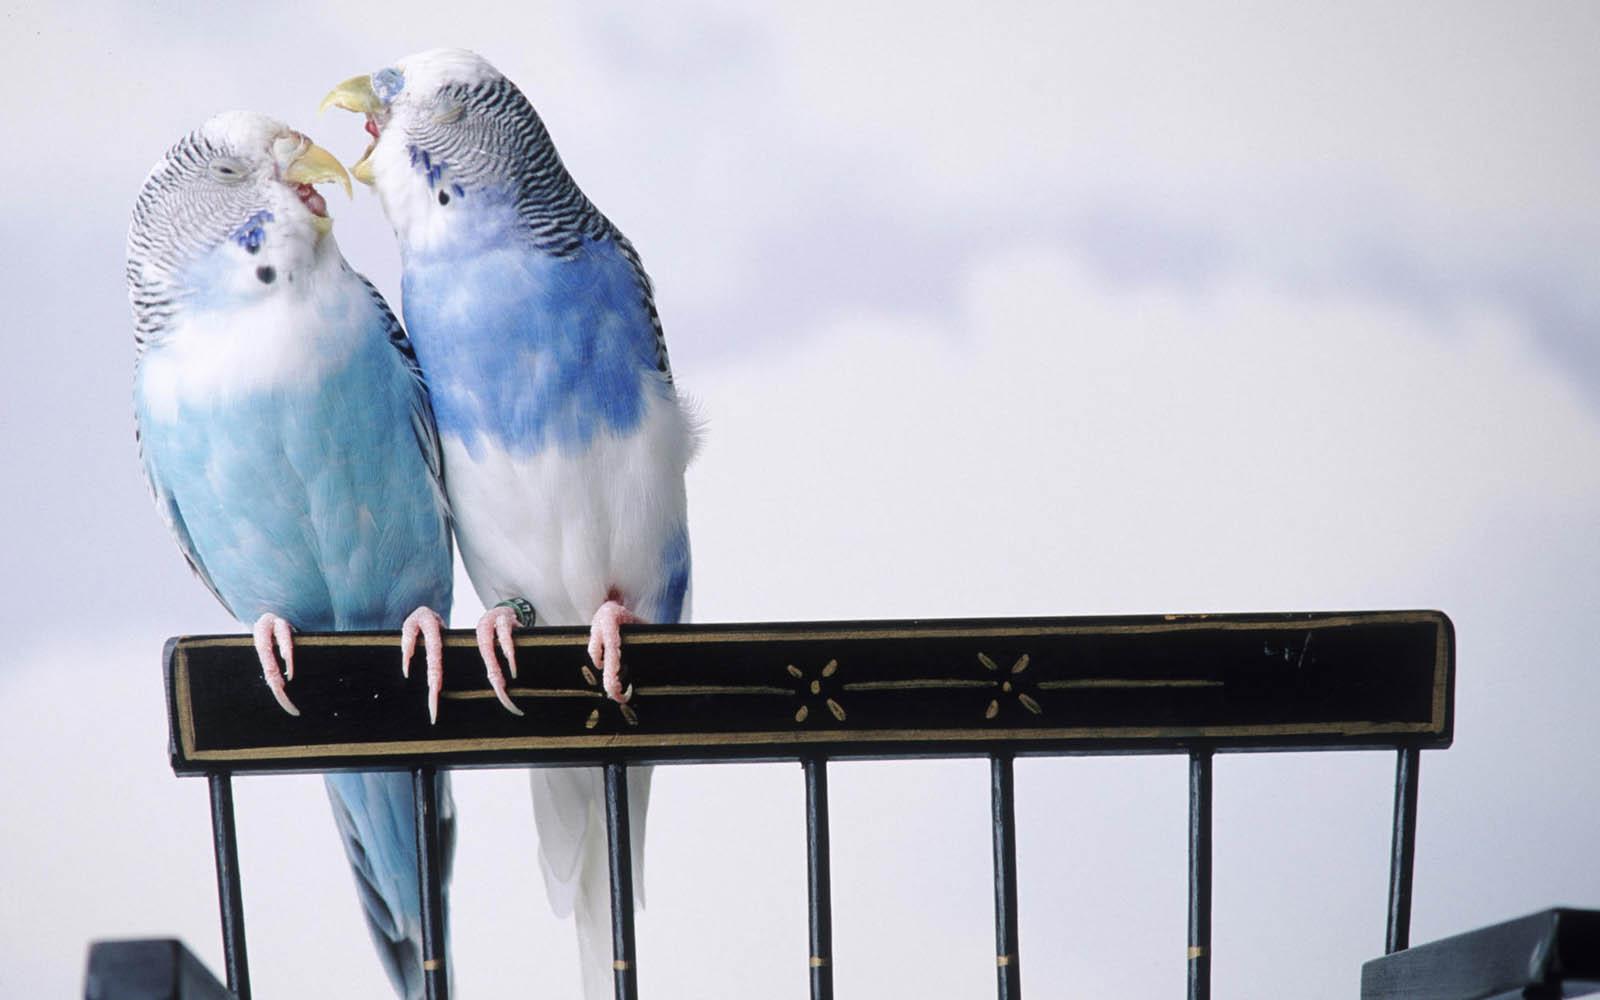 http://2.bp.blogspot.com/-e8B1i-atqHg/USusa4J2GlI/AAAAAAAATvo/JLBR2x-D7gE/s1600/Love+Birds+Desktop+Wallpapers+1.jpg